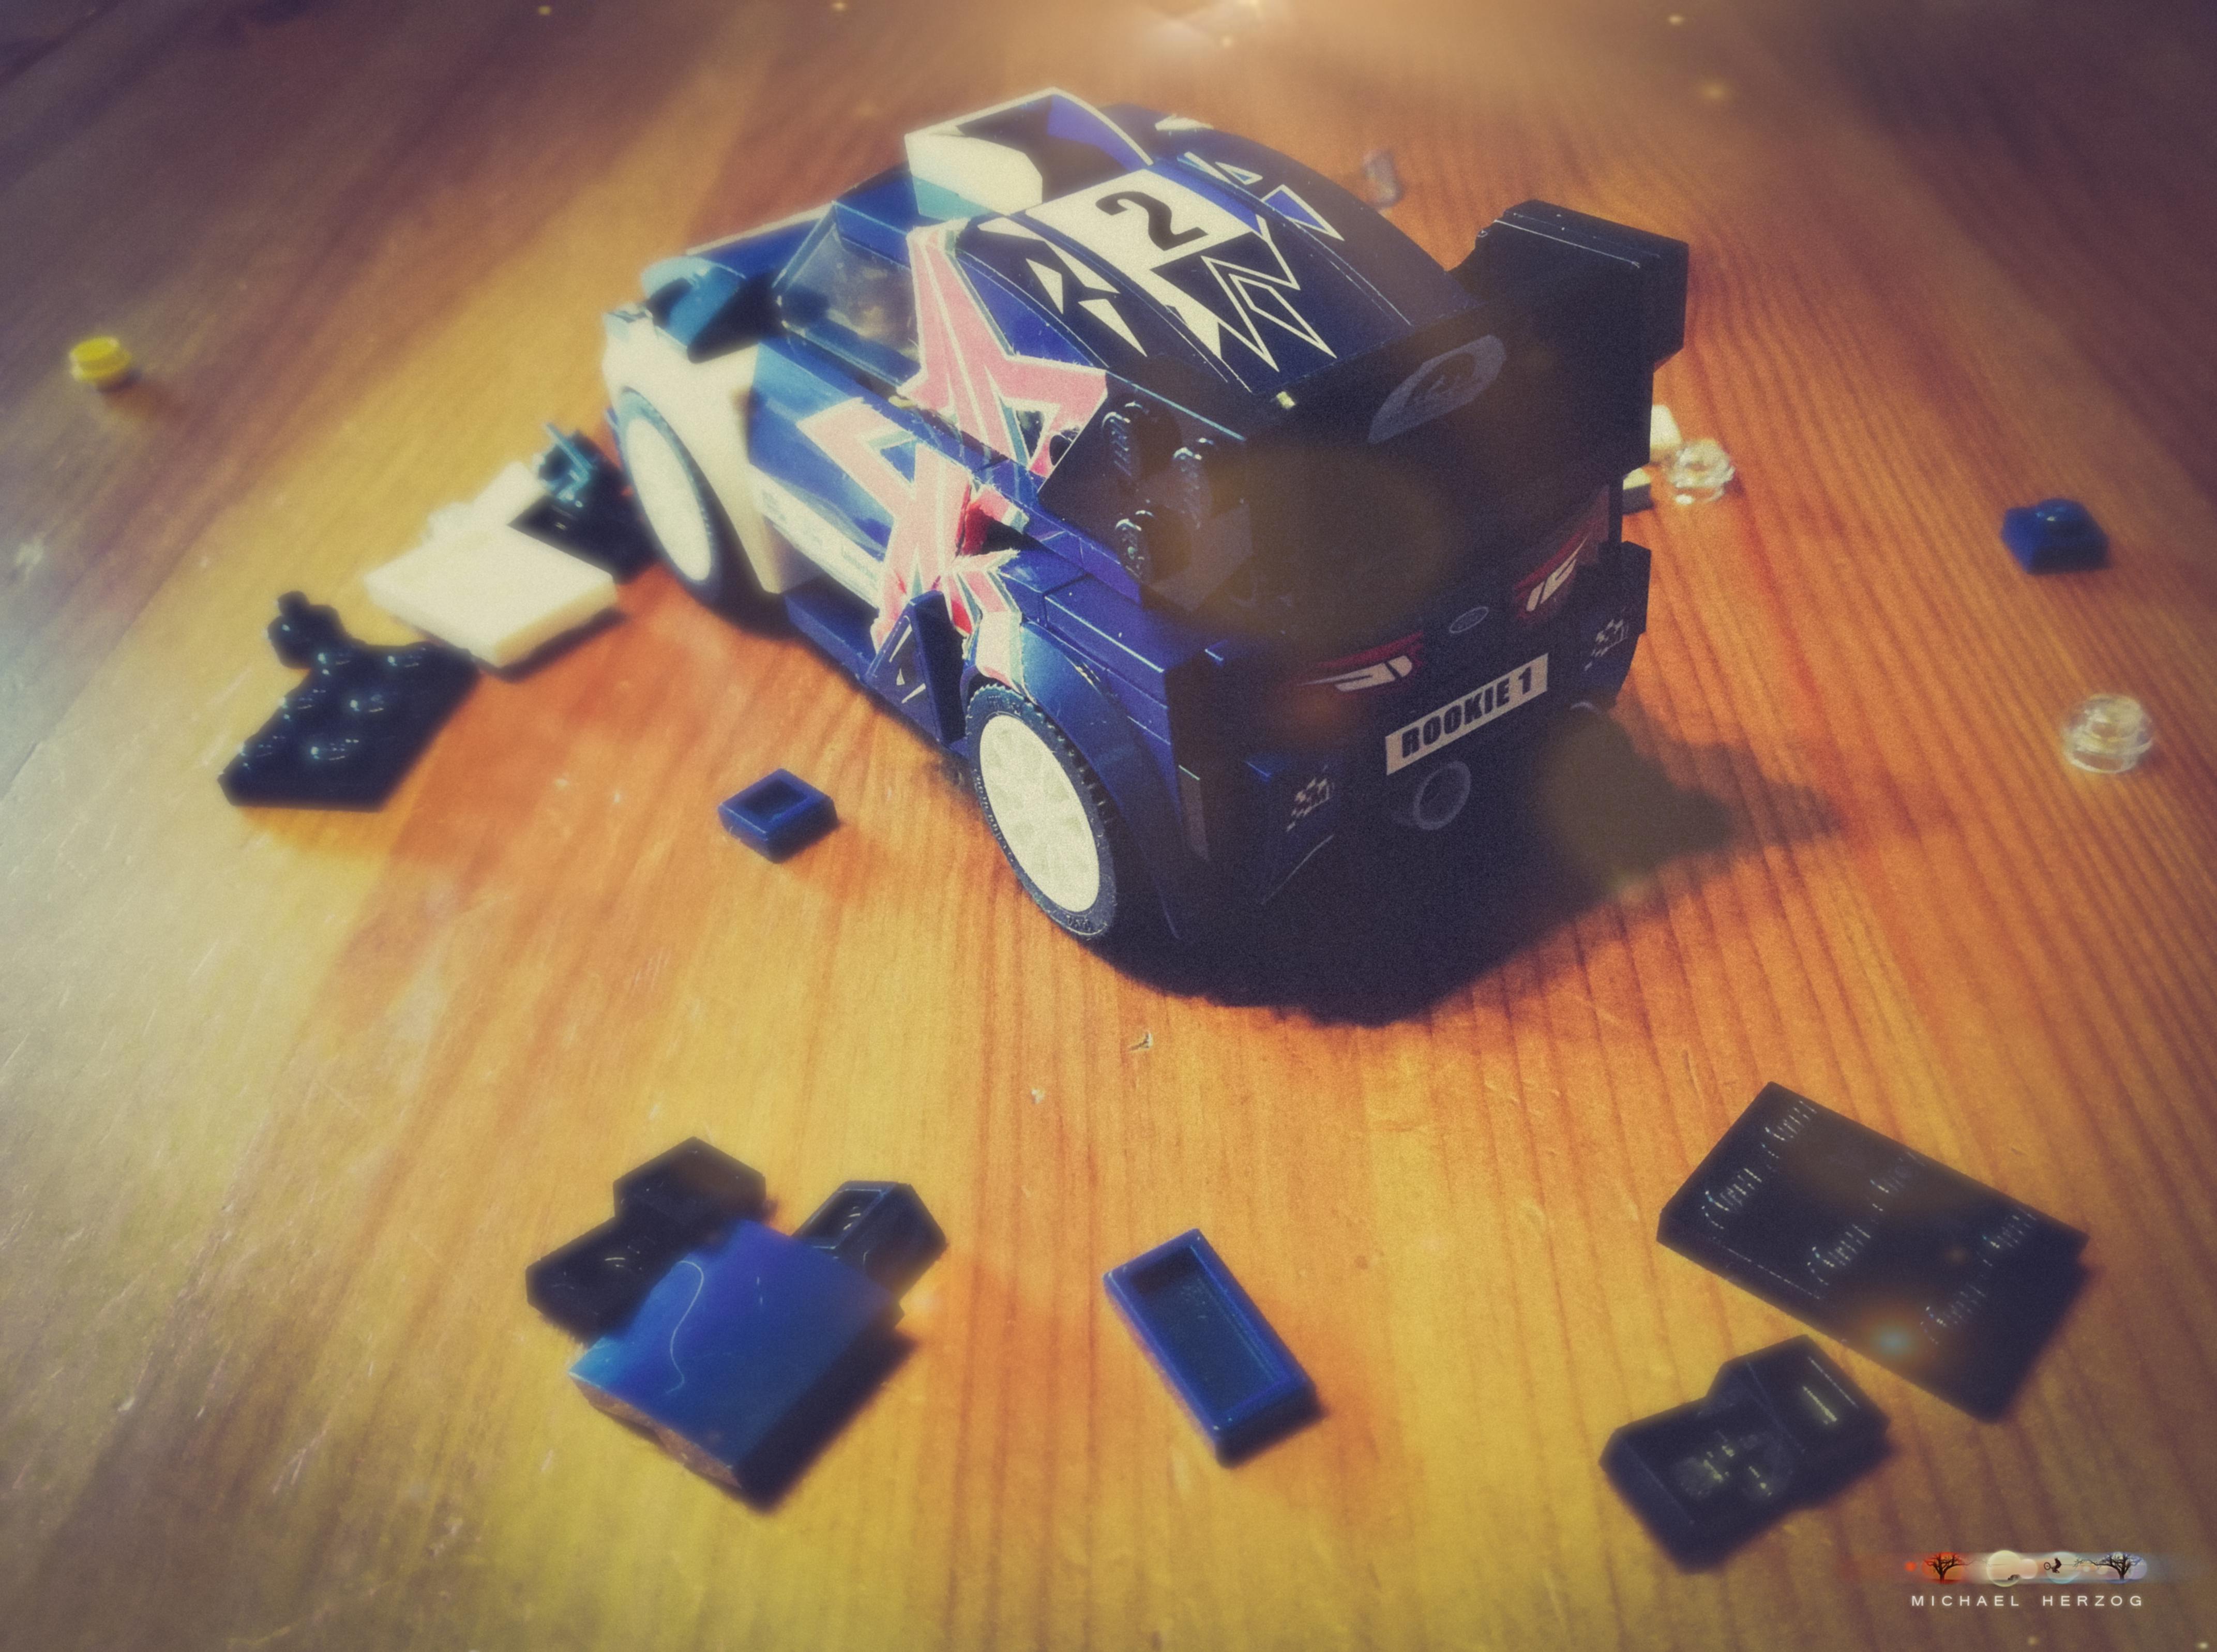 RacingRookie2019_Lego-Ford-Fiesta_Speedchampion_RookieEdition_AUTrenalinStudios-03.jpg